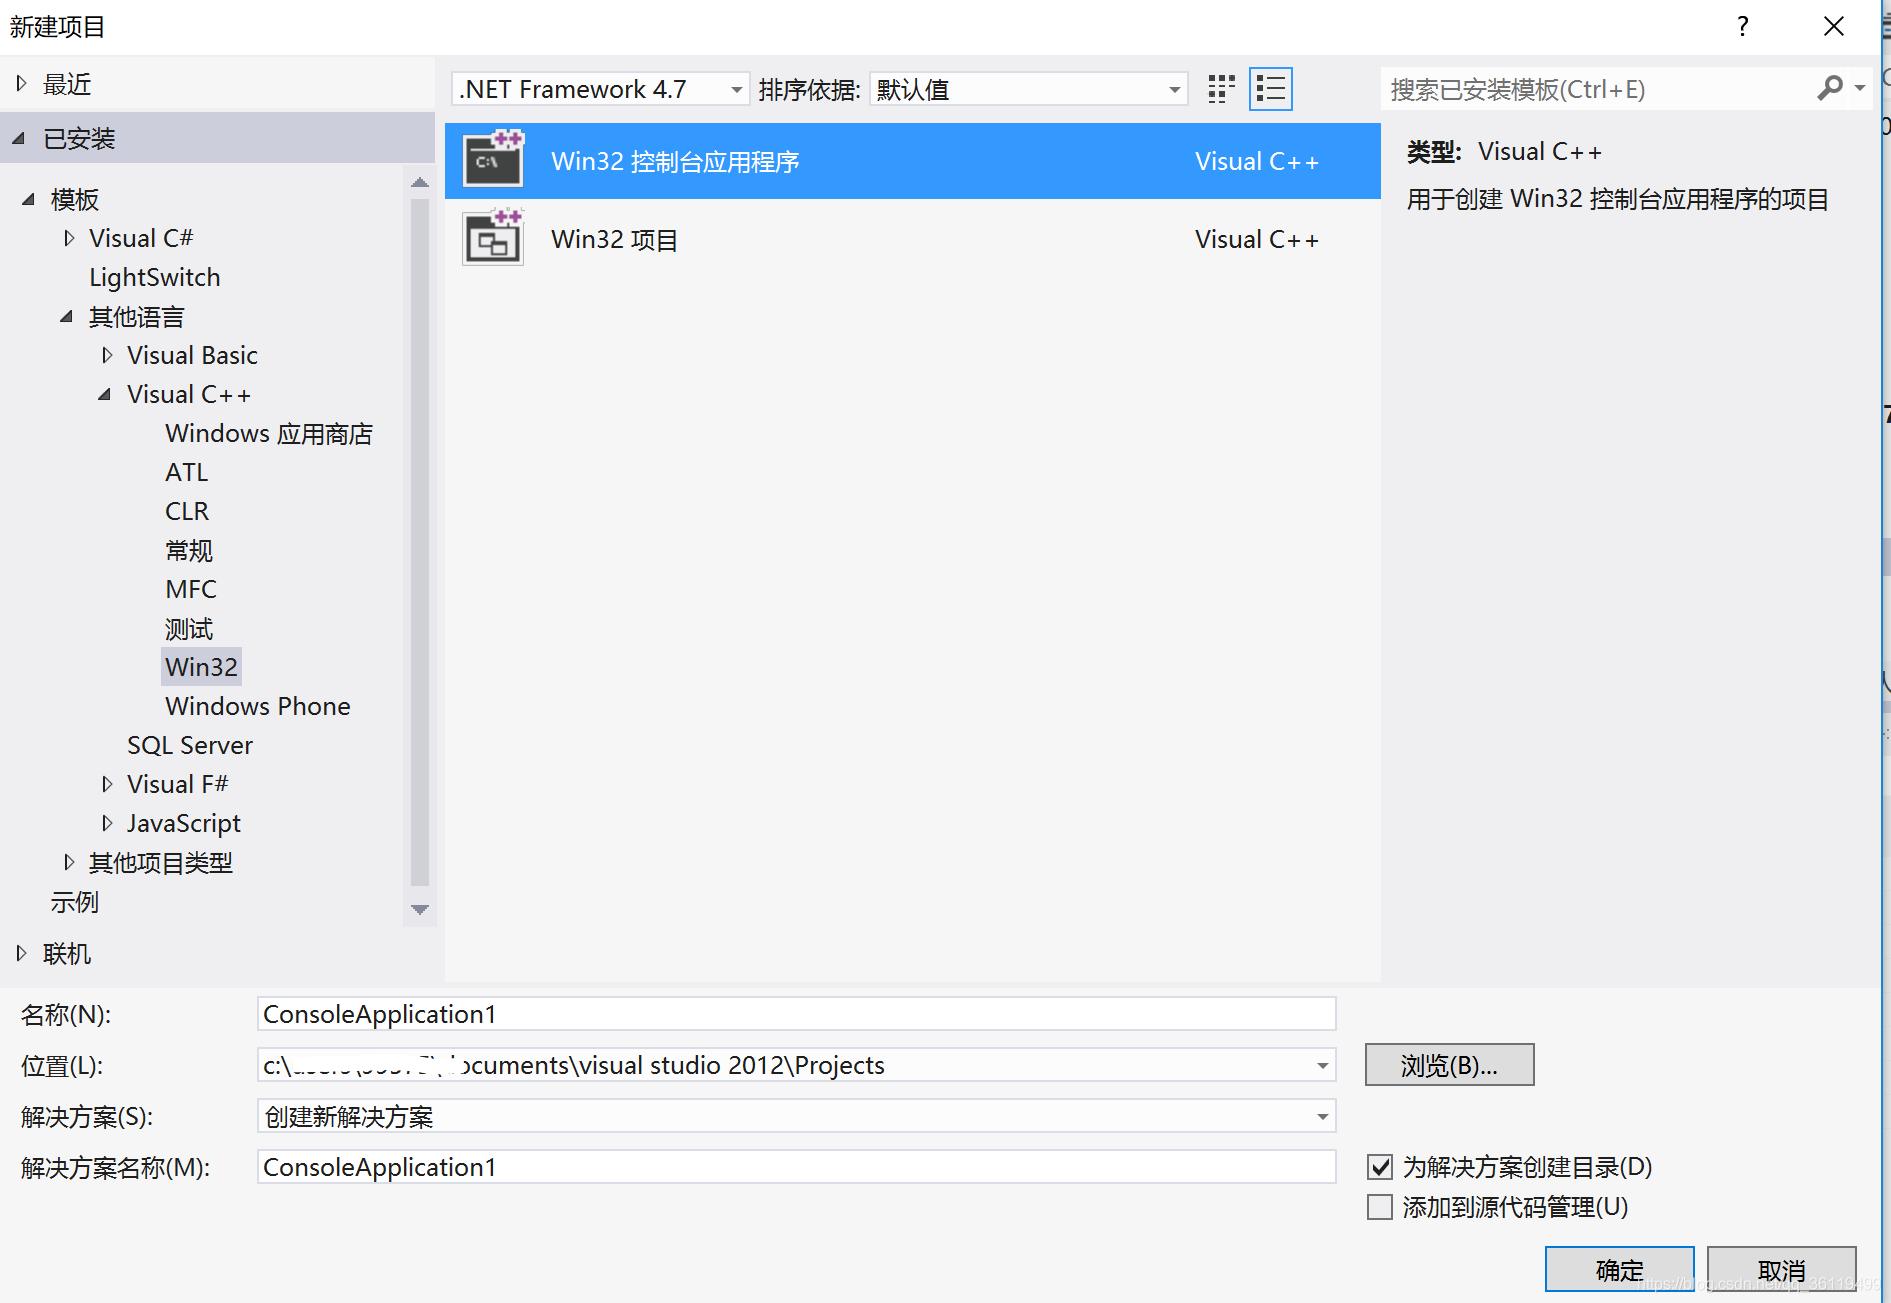 https://img-blog.csdnimg.cn/20190307102925480.png?x-oss-process=image/watermark,type_ZmFuZ3poZW5naGVpdGk,shadow_10,text_aHR0cHM6Ly9ibG9nLmNzZG4ubmV0L3FxXzM2MTE5NDk5,size_16,color_FFFFFF,t_70